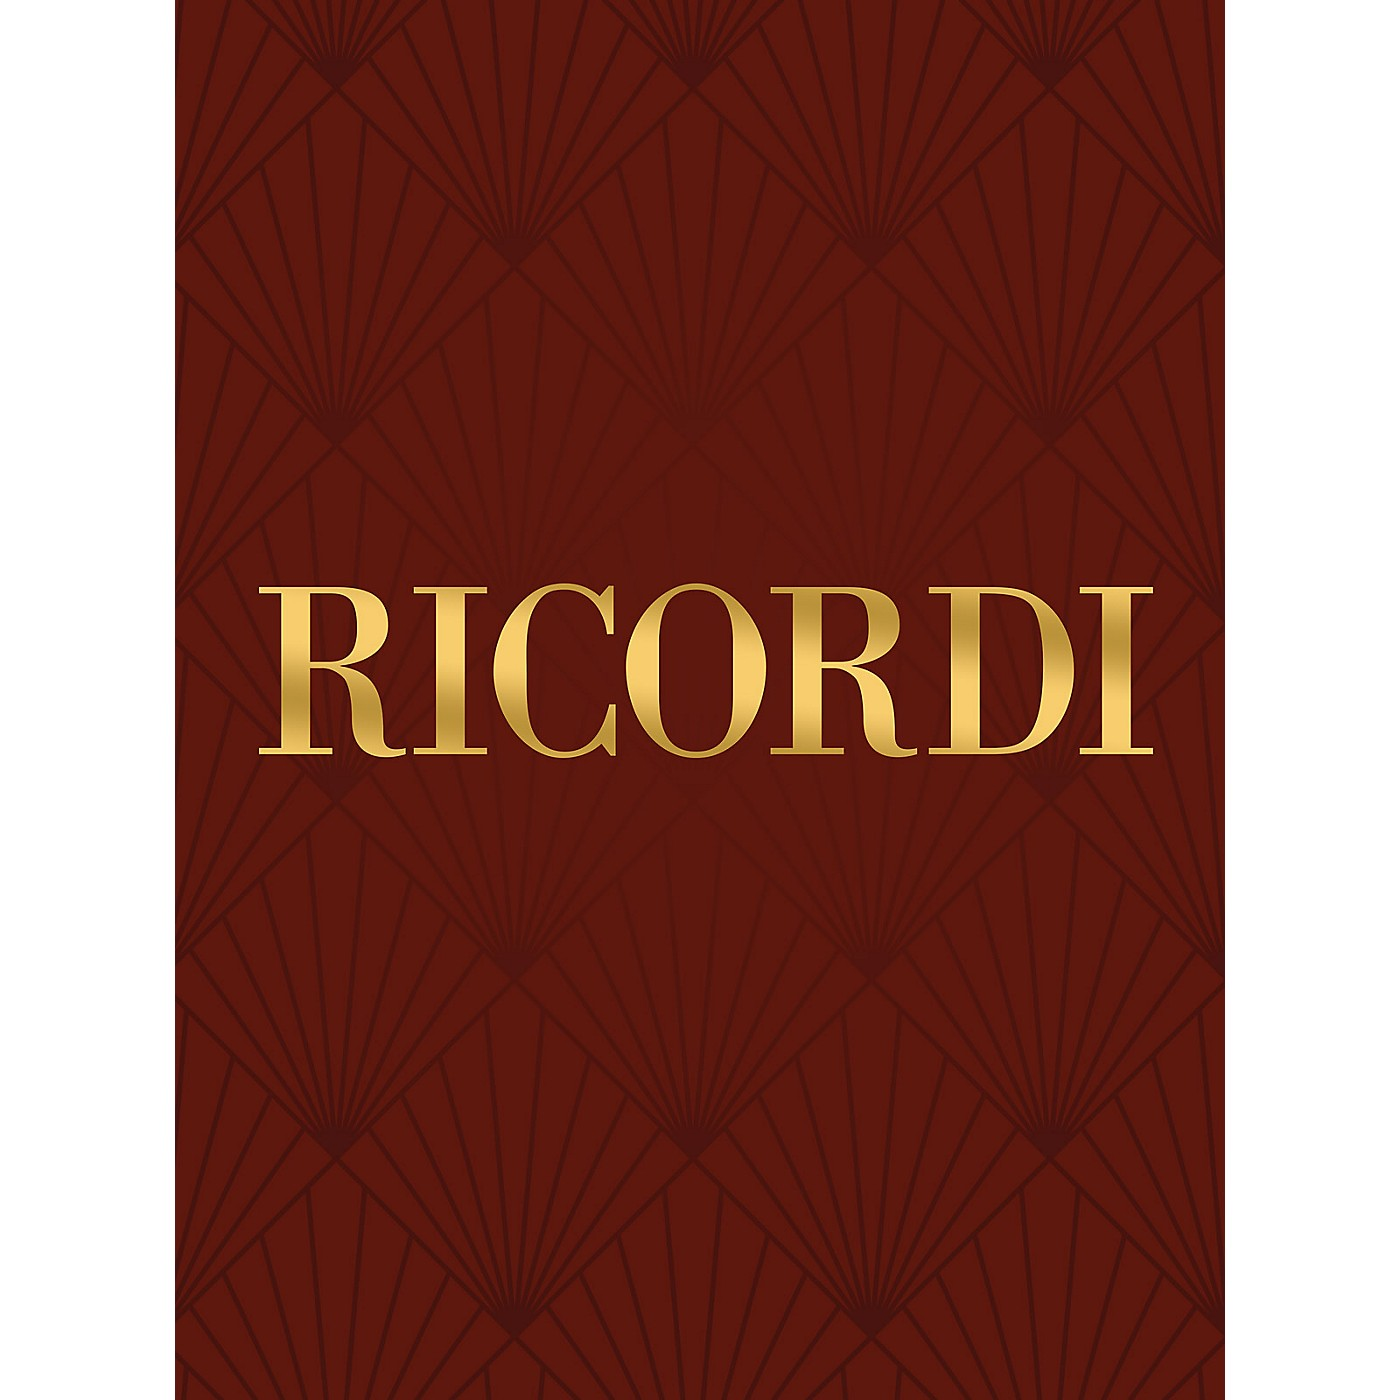 Ricordi Bach For My Guitar Special Import by Johann Sebastian Bach Edited by Venancio Garcia Velasco thumbnail